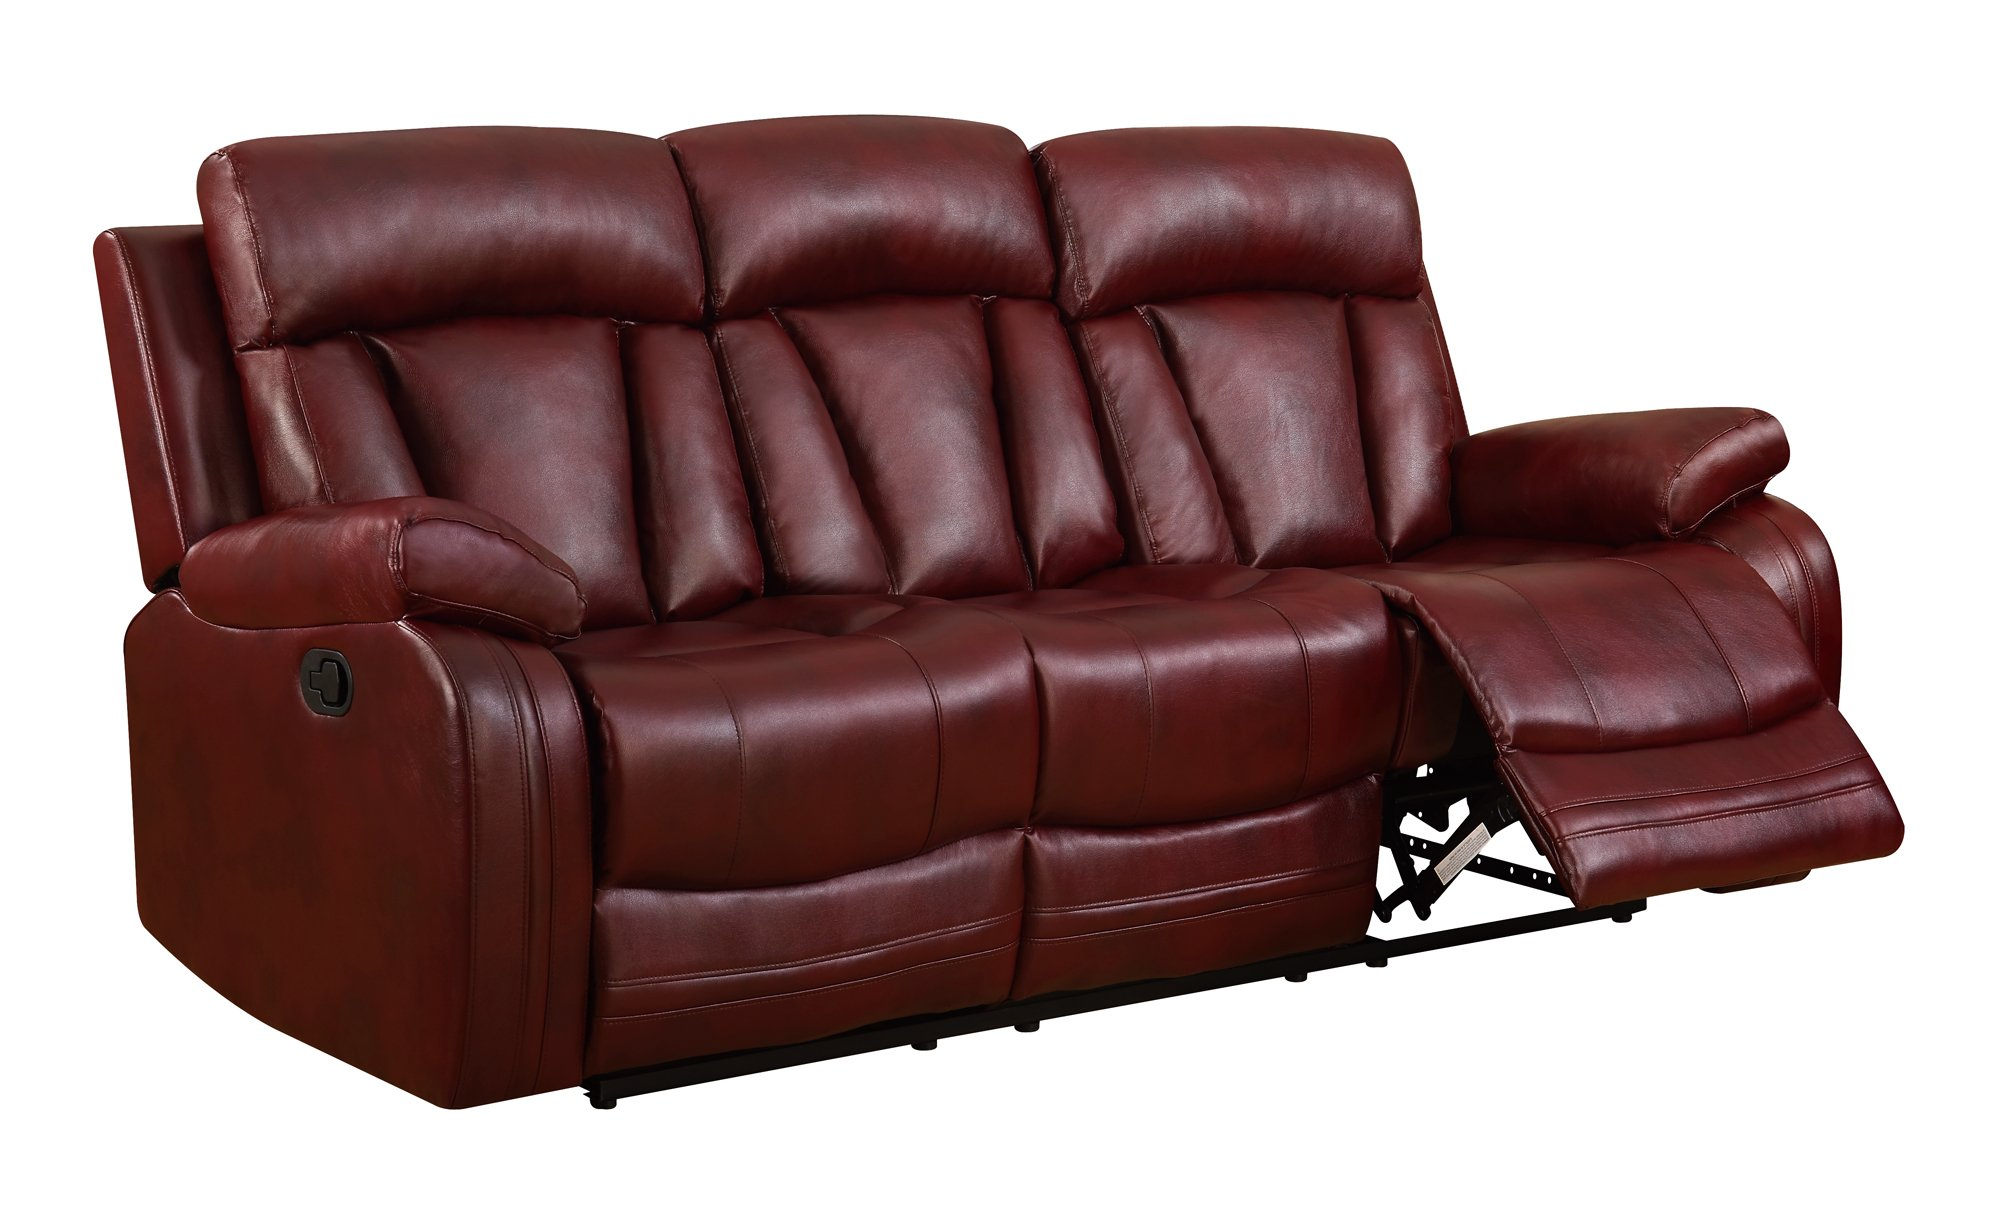 u97601 burgundy pu reclining sofa by global furniture. Black Bedroom Furniture Sets. Home Design Ideas